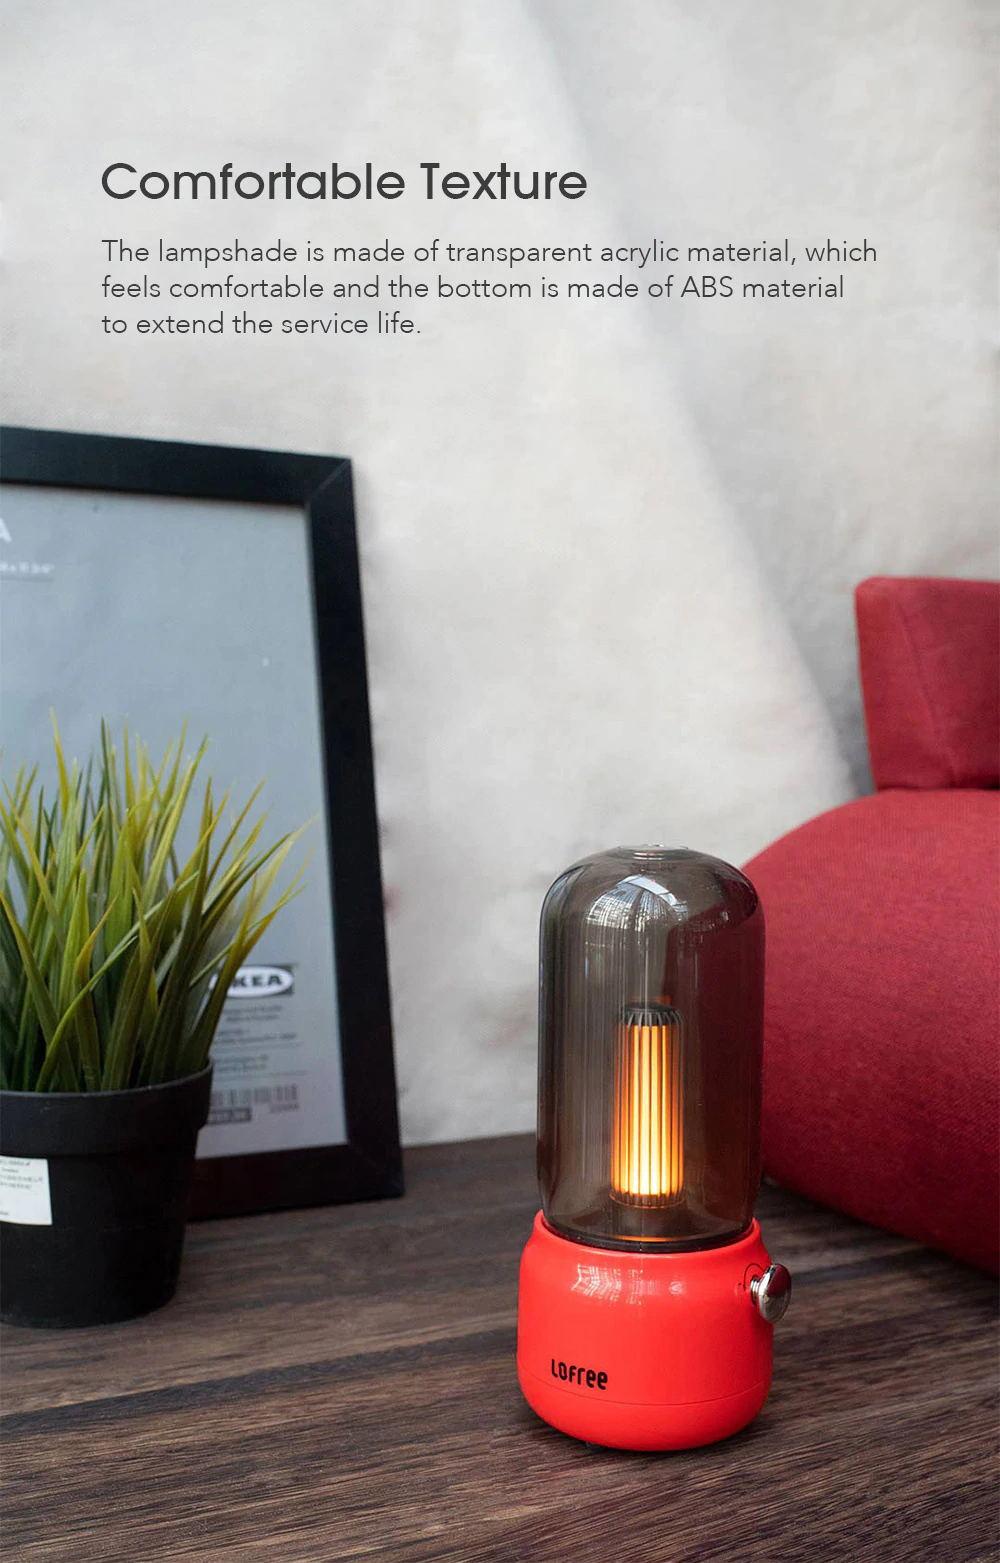 lofree candly lamp